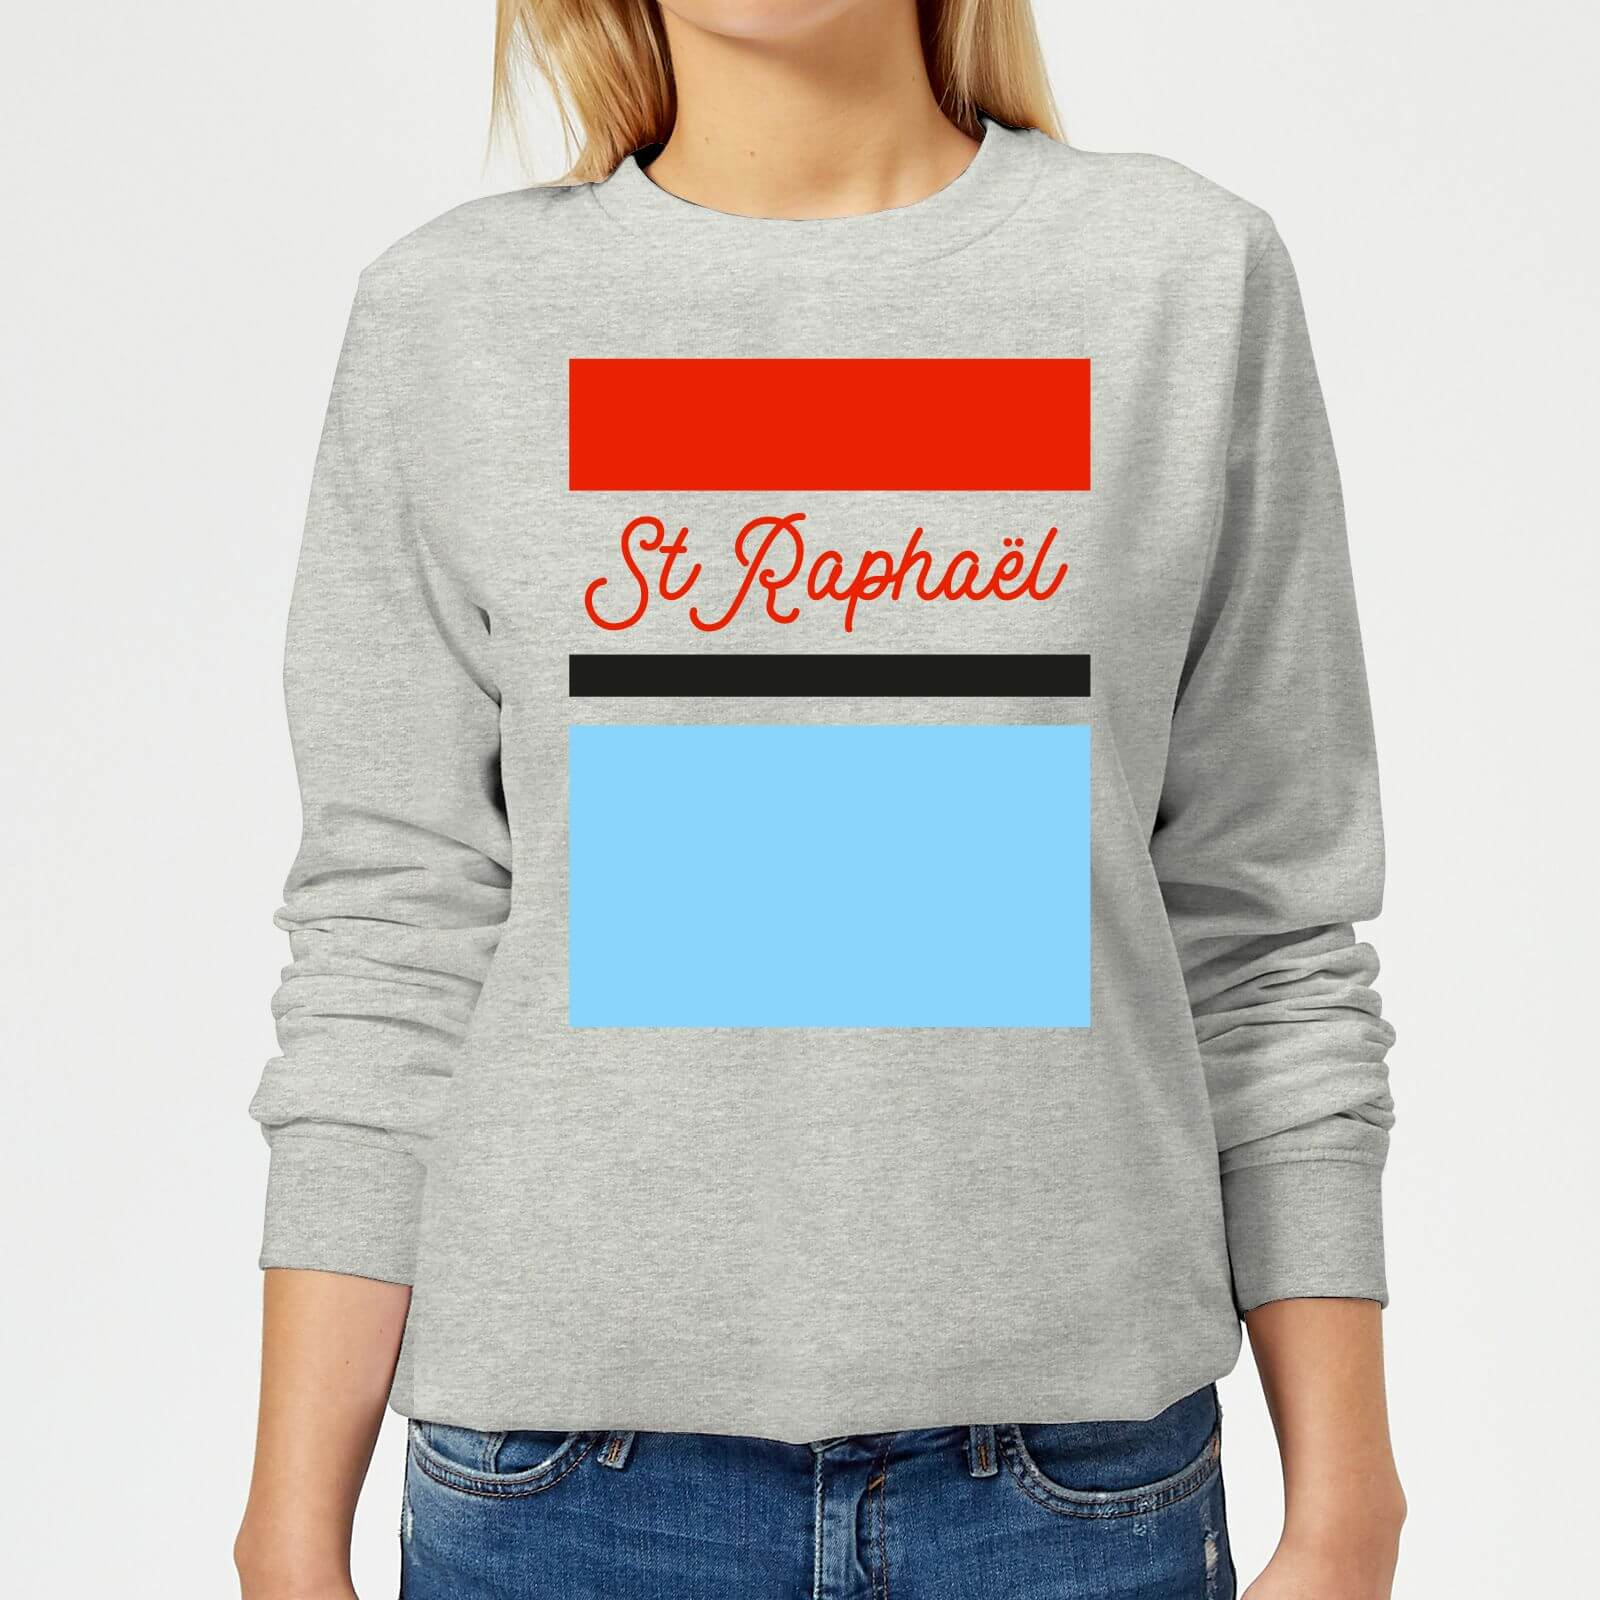 Summit Finish St Raphael Women's Sweatshirt - Grey - XL - Grey